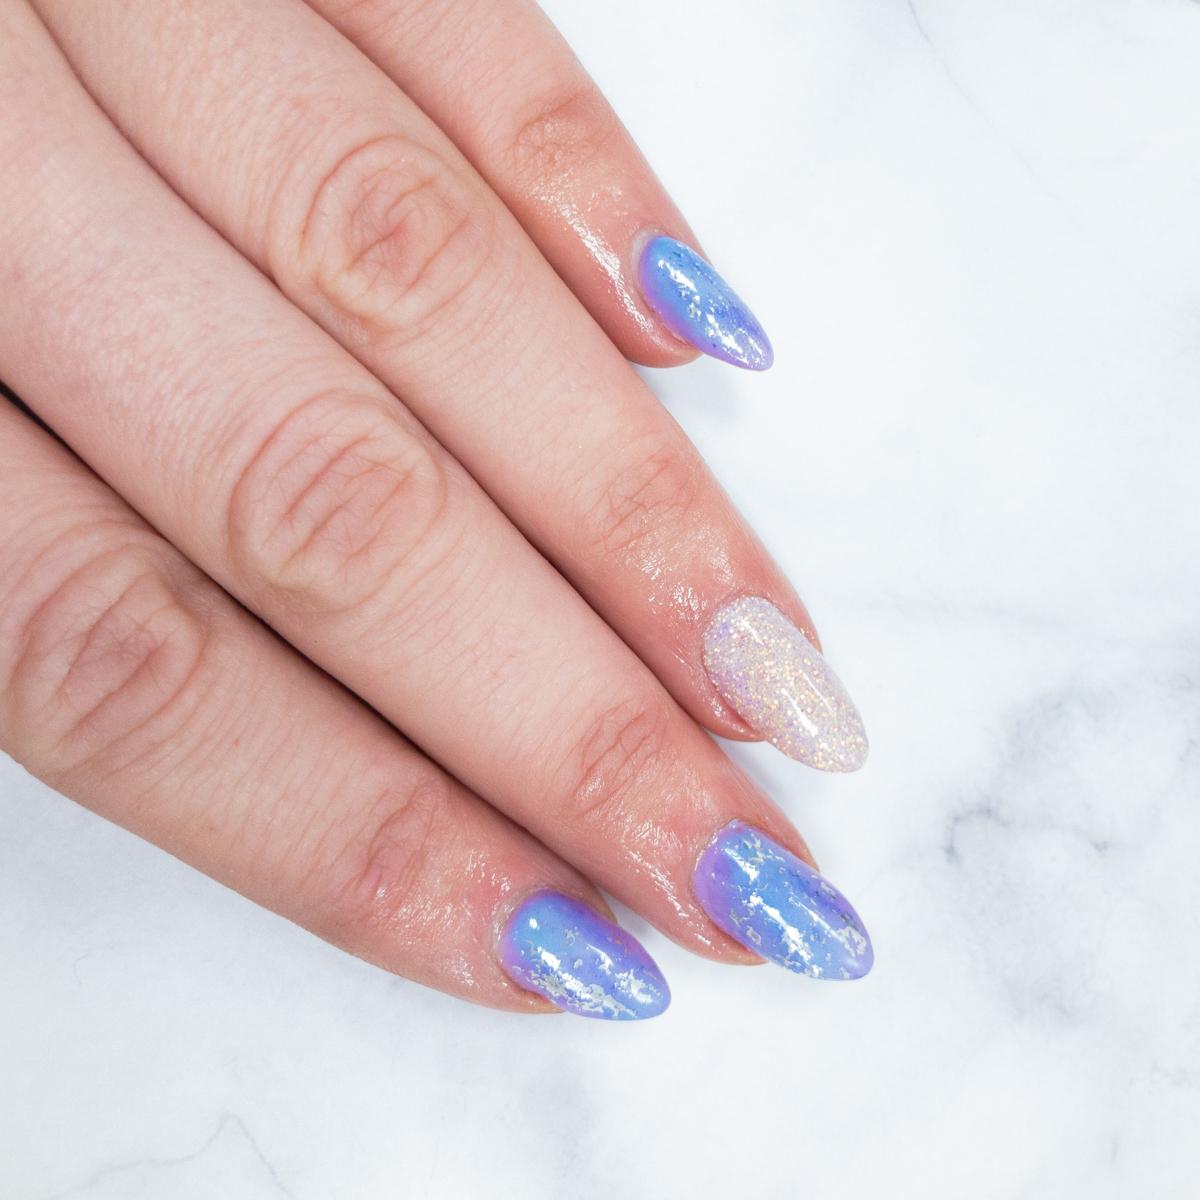 Fairytale Daydreams  Powder blue and lilac gel polish with marbling, silver foil and fairytale glitter  #gelpolish #gelnails #bluenails #lilacnails #silvernails #glitternails #marblenails #marblenailsart #nailsdoncaster #doncasternails #nailsalon #heynailspic.twitter.com/0tn32pjhhu